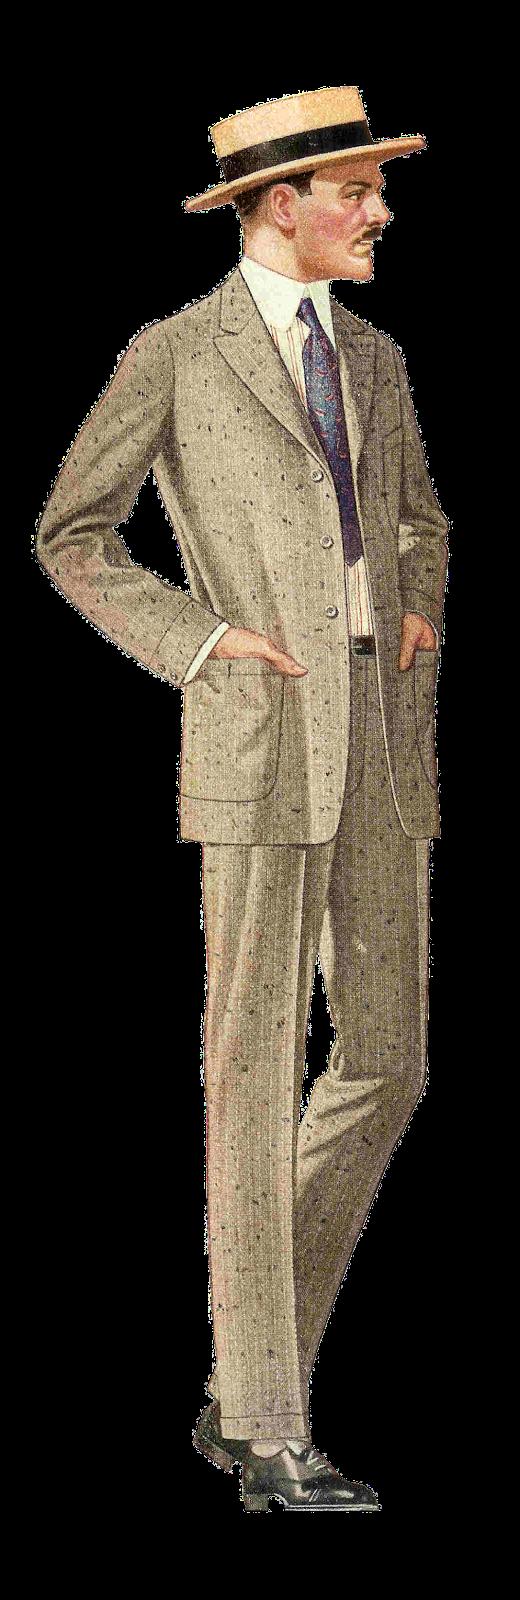 Coat men's suit